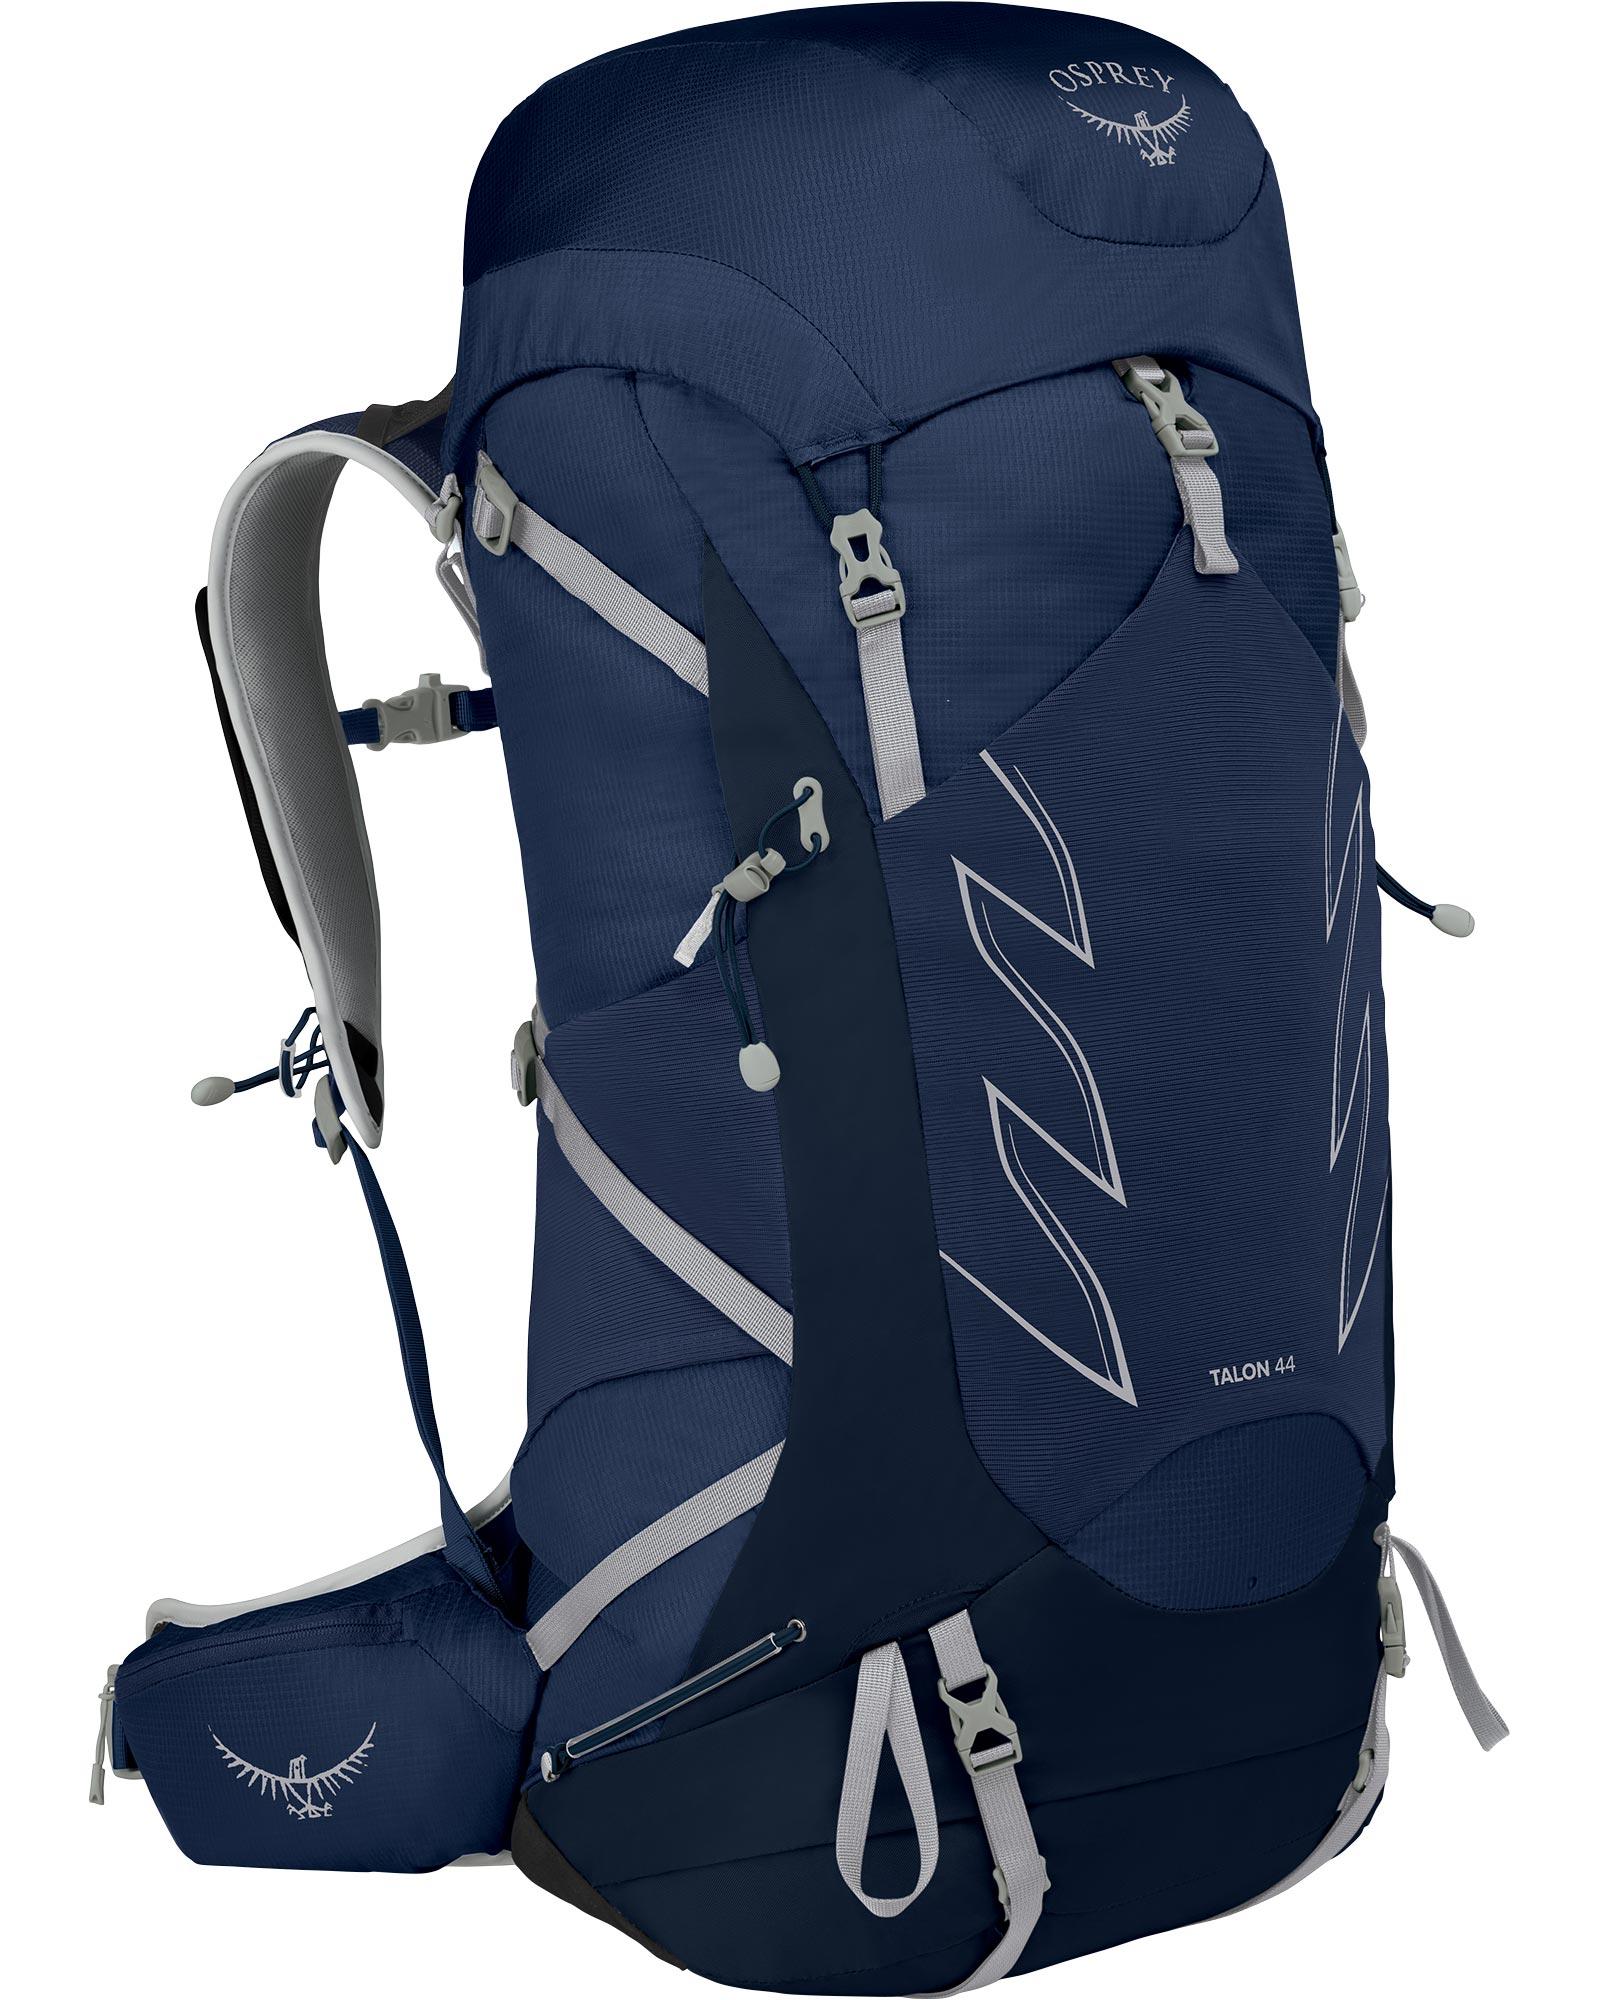 Osprey Men's Talon 44 Backpack 0